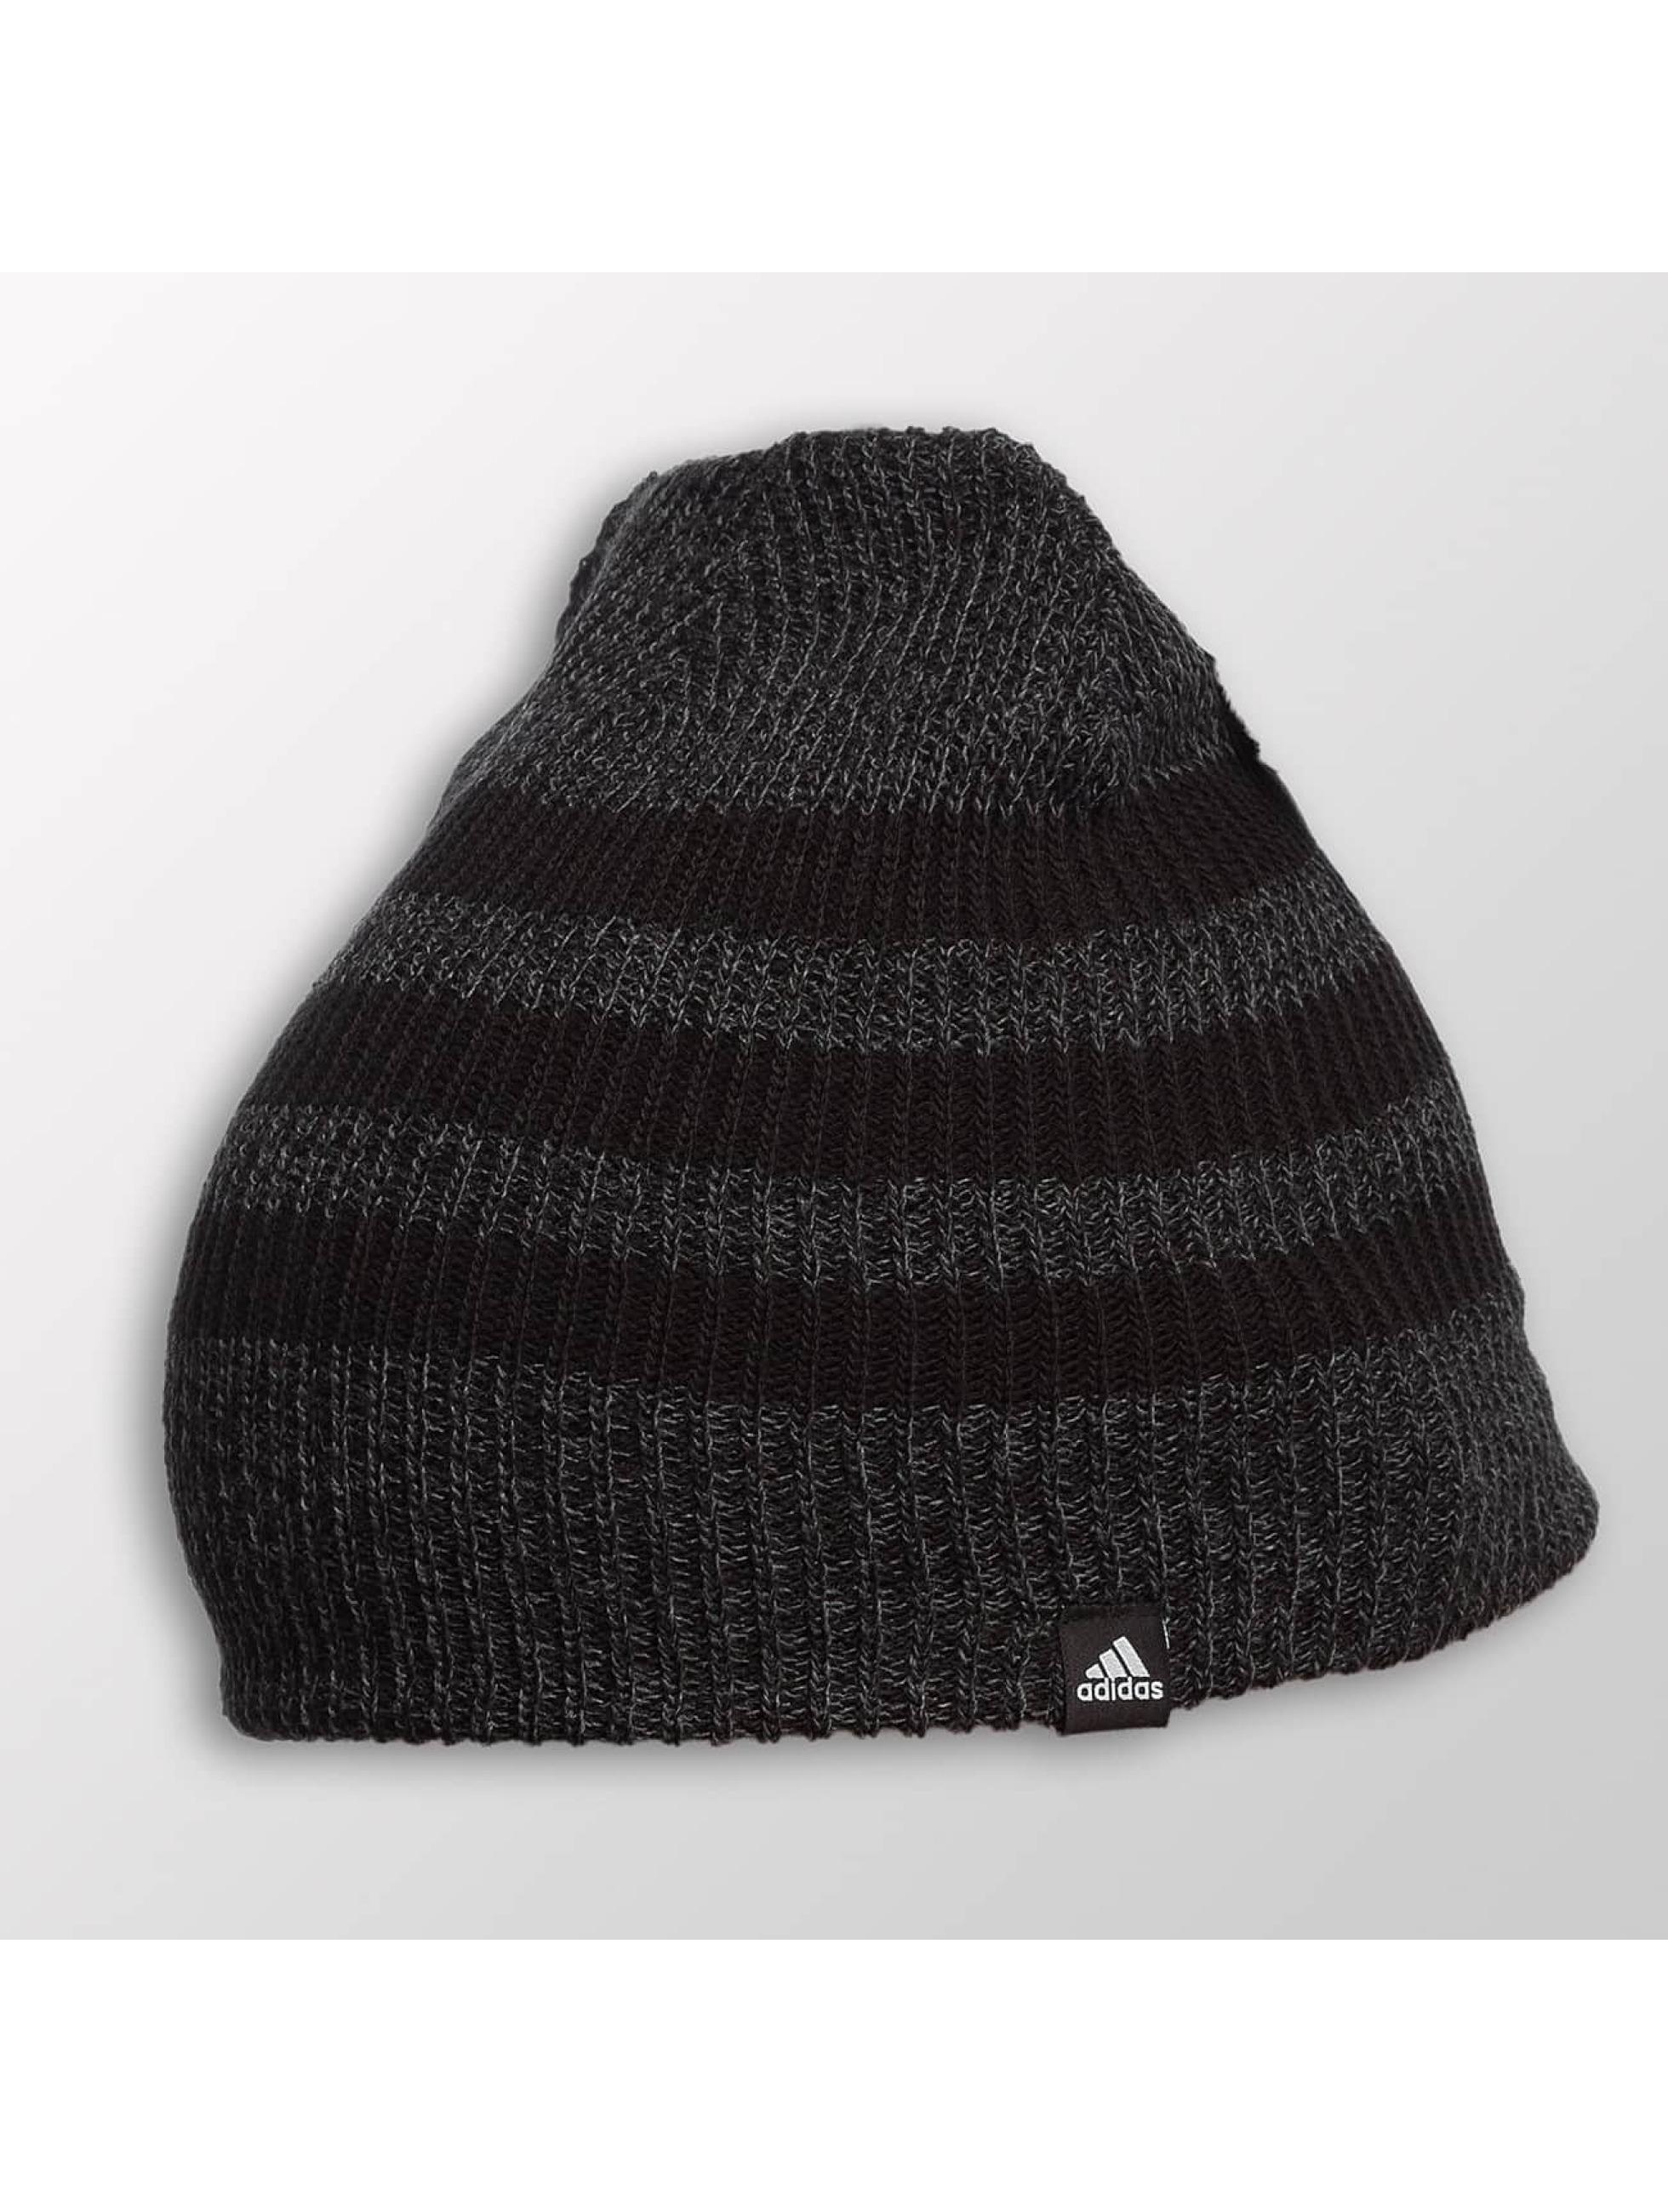 adidas Pipot Adidas 3S musta